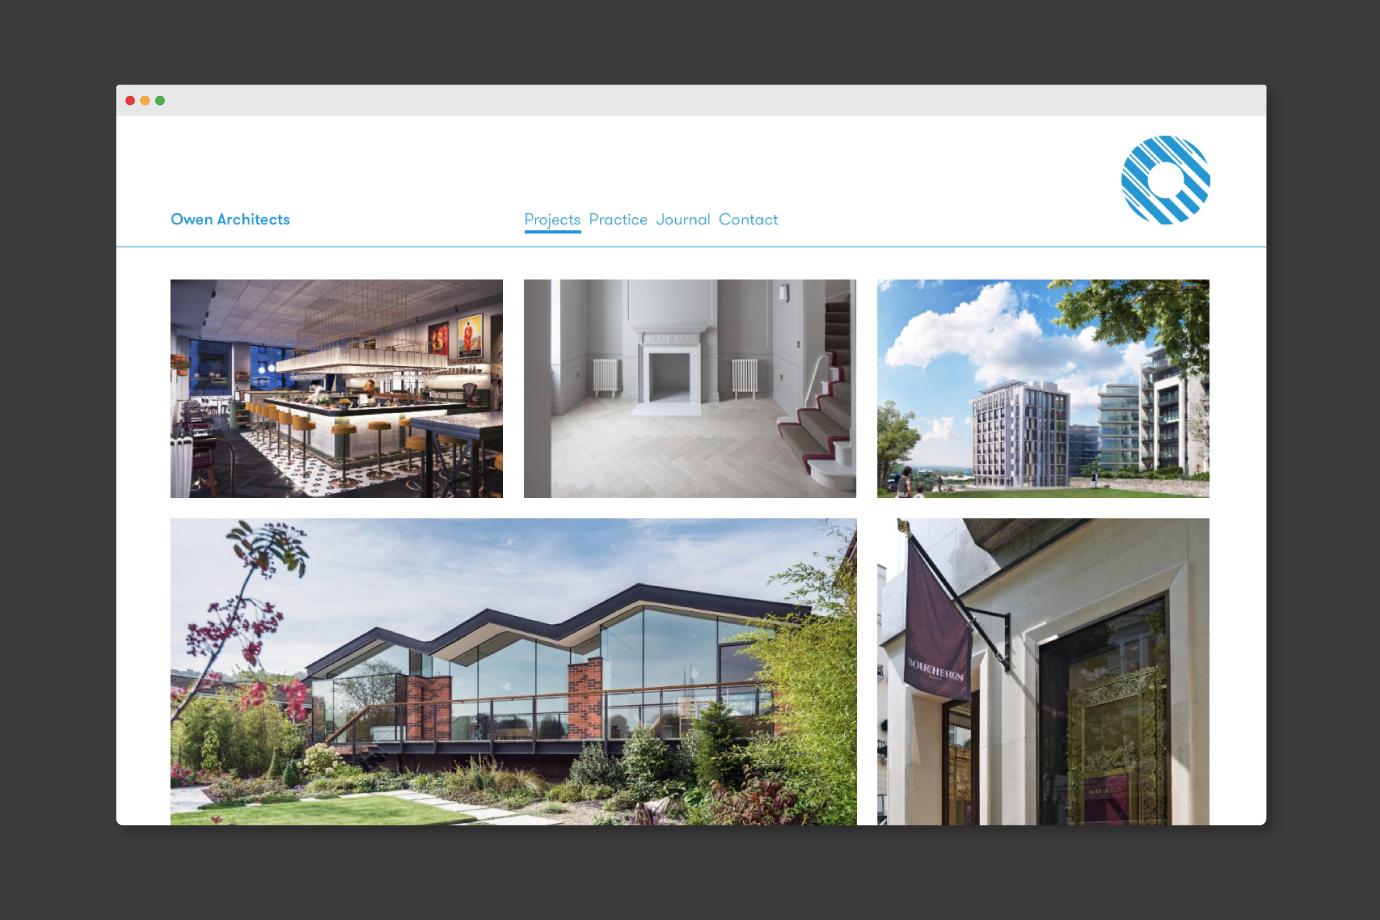 https://spystudio.co.uk/wp-content/uploads/2017/03/Owen_Architects_web-2.jpg